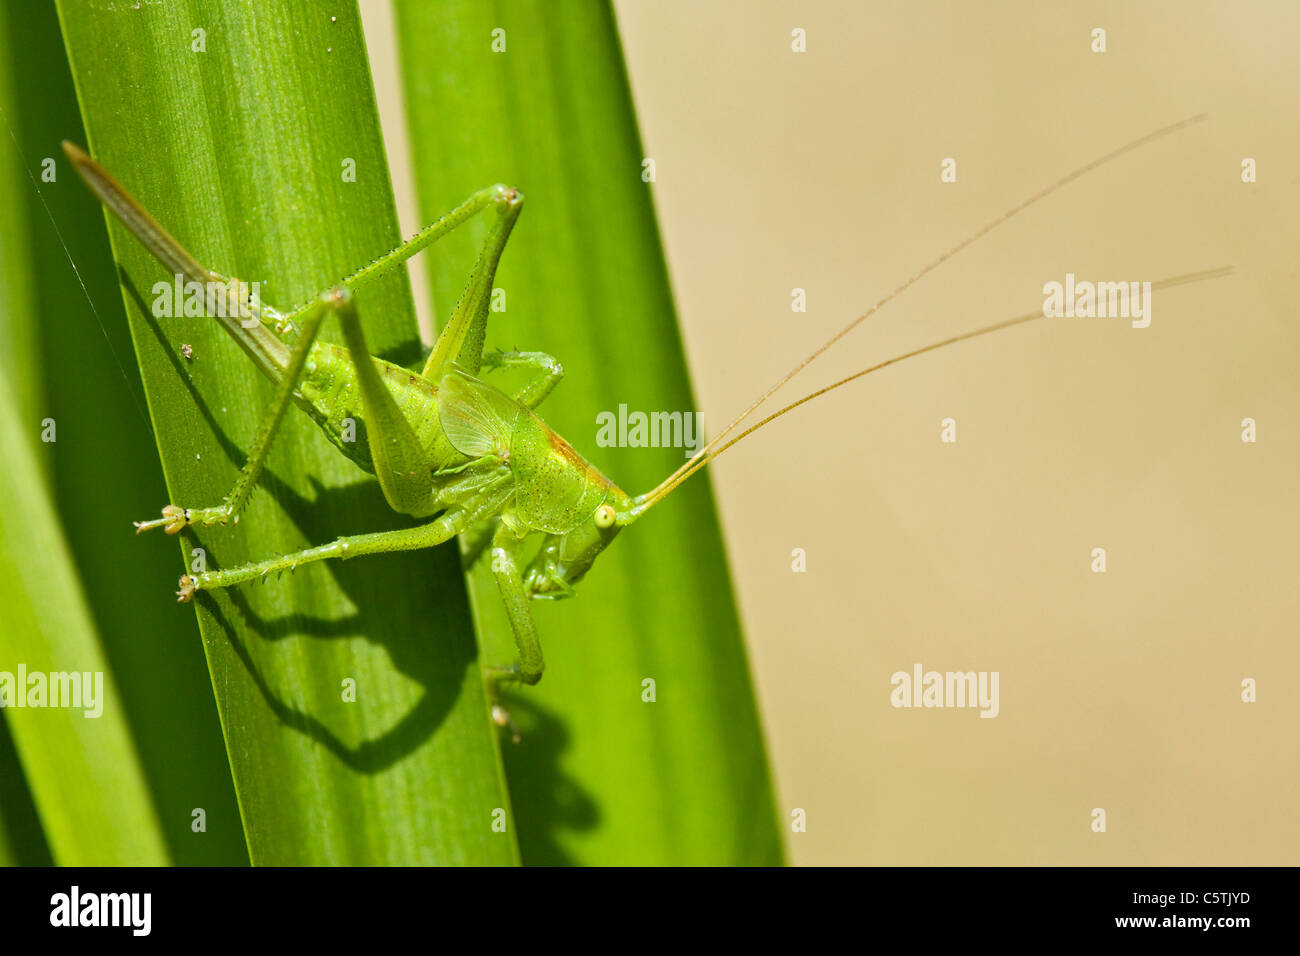 Große grüne Bush Cricket (Tettigonia Viridissima) im Blatt, Nahaufnahme Stockbild